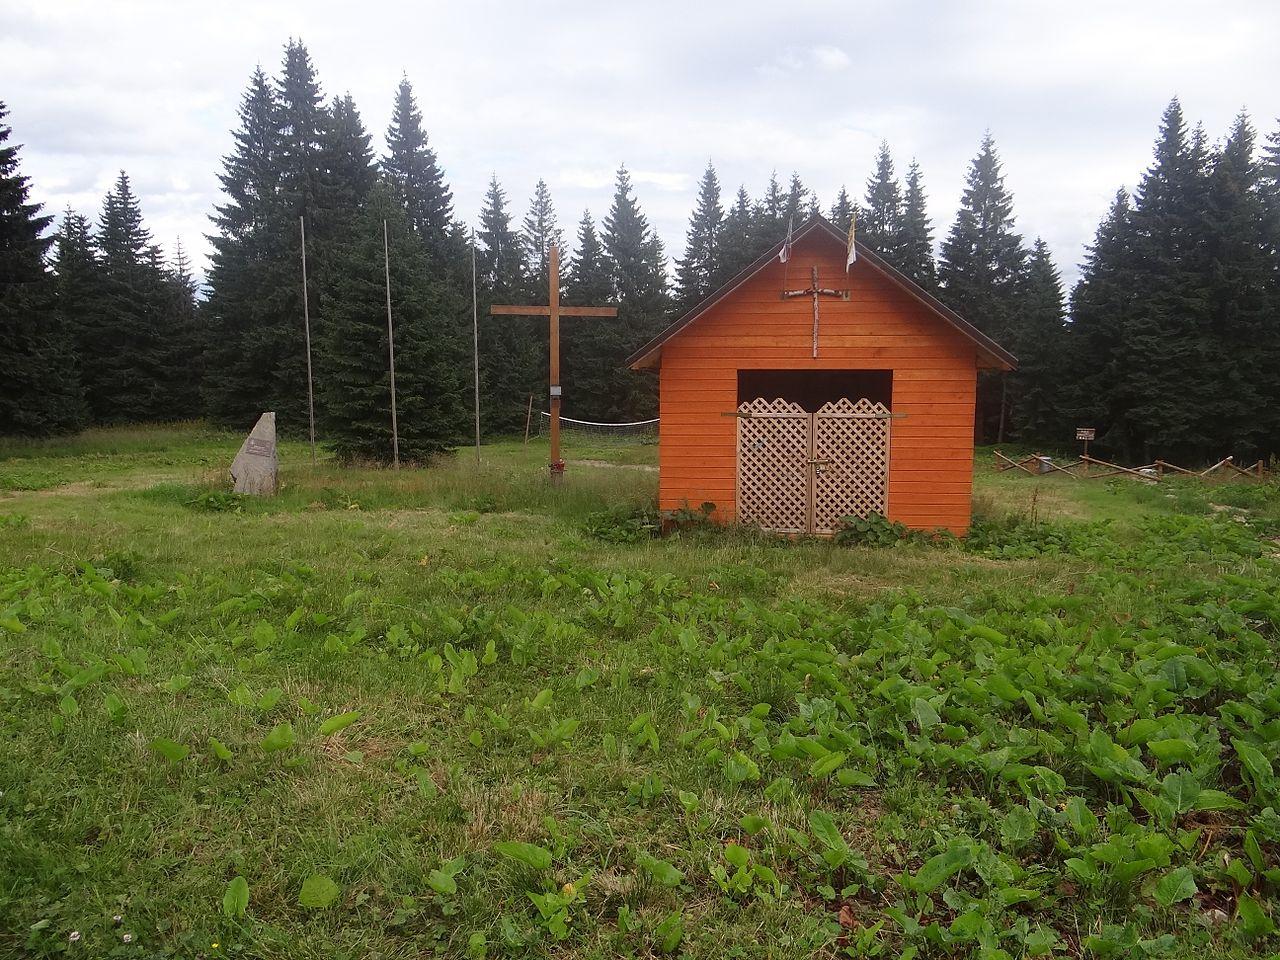 Szlak turystyczny – Hala Boracza – Lipowska